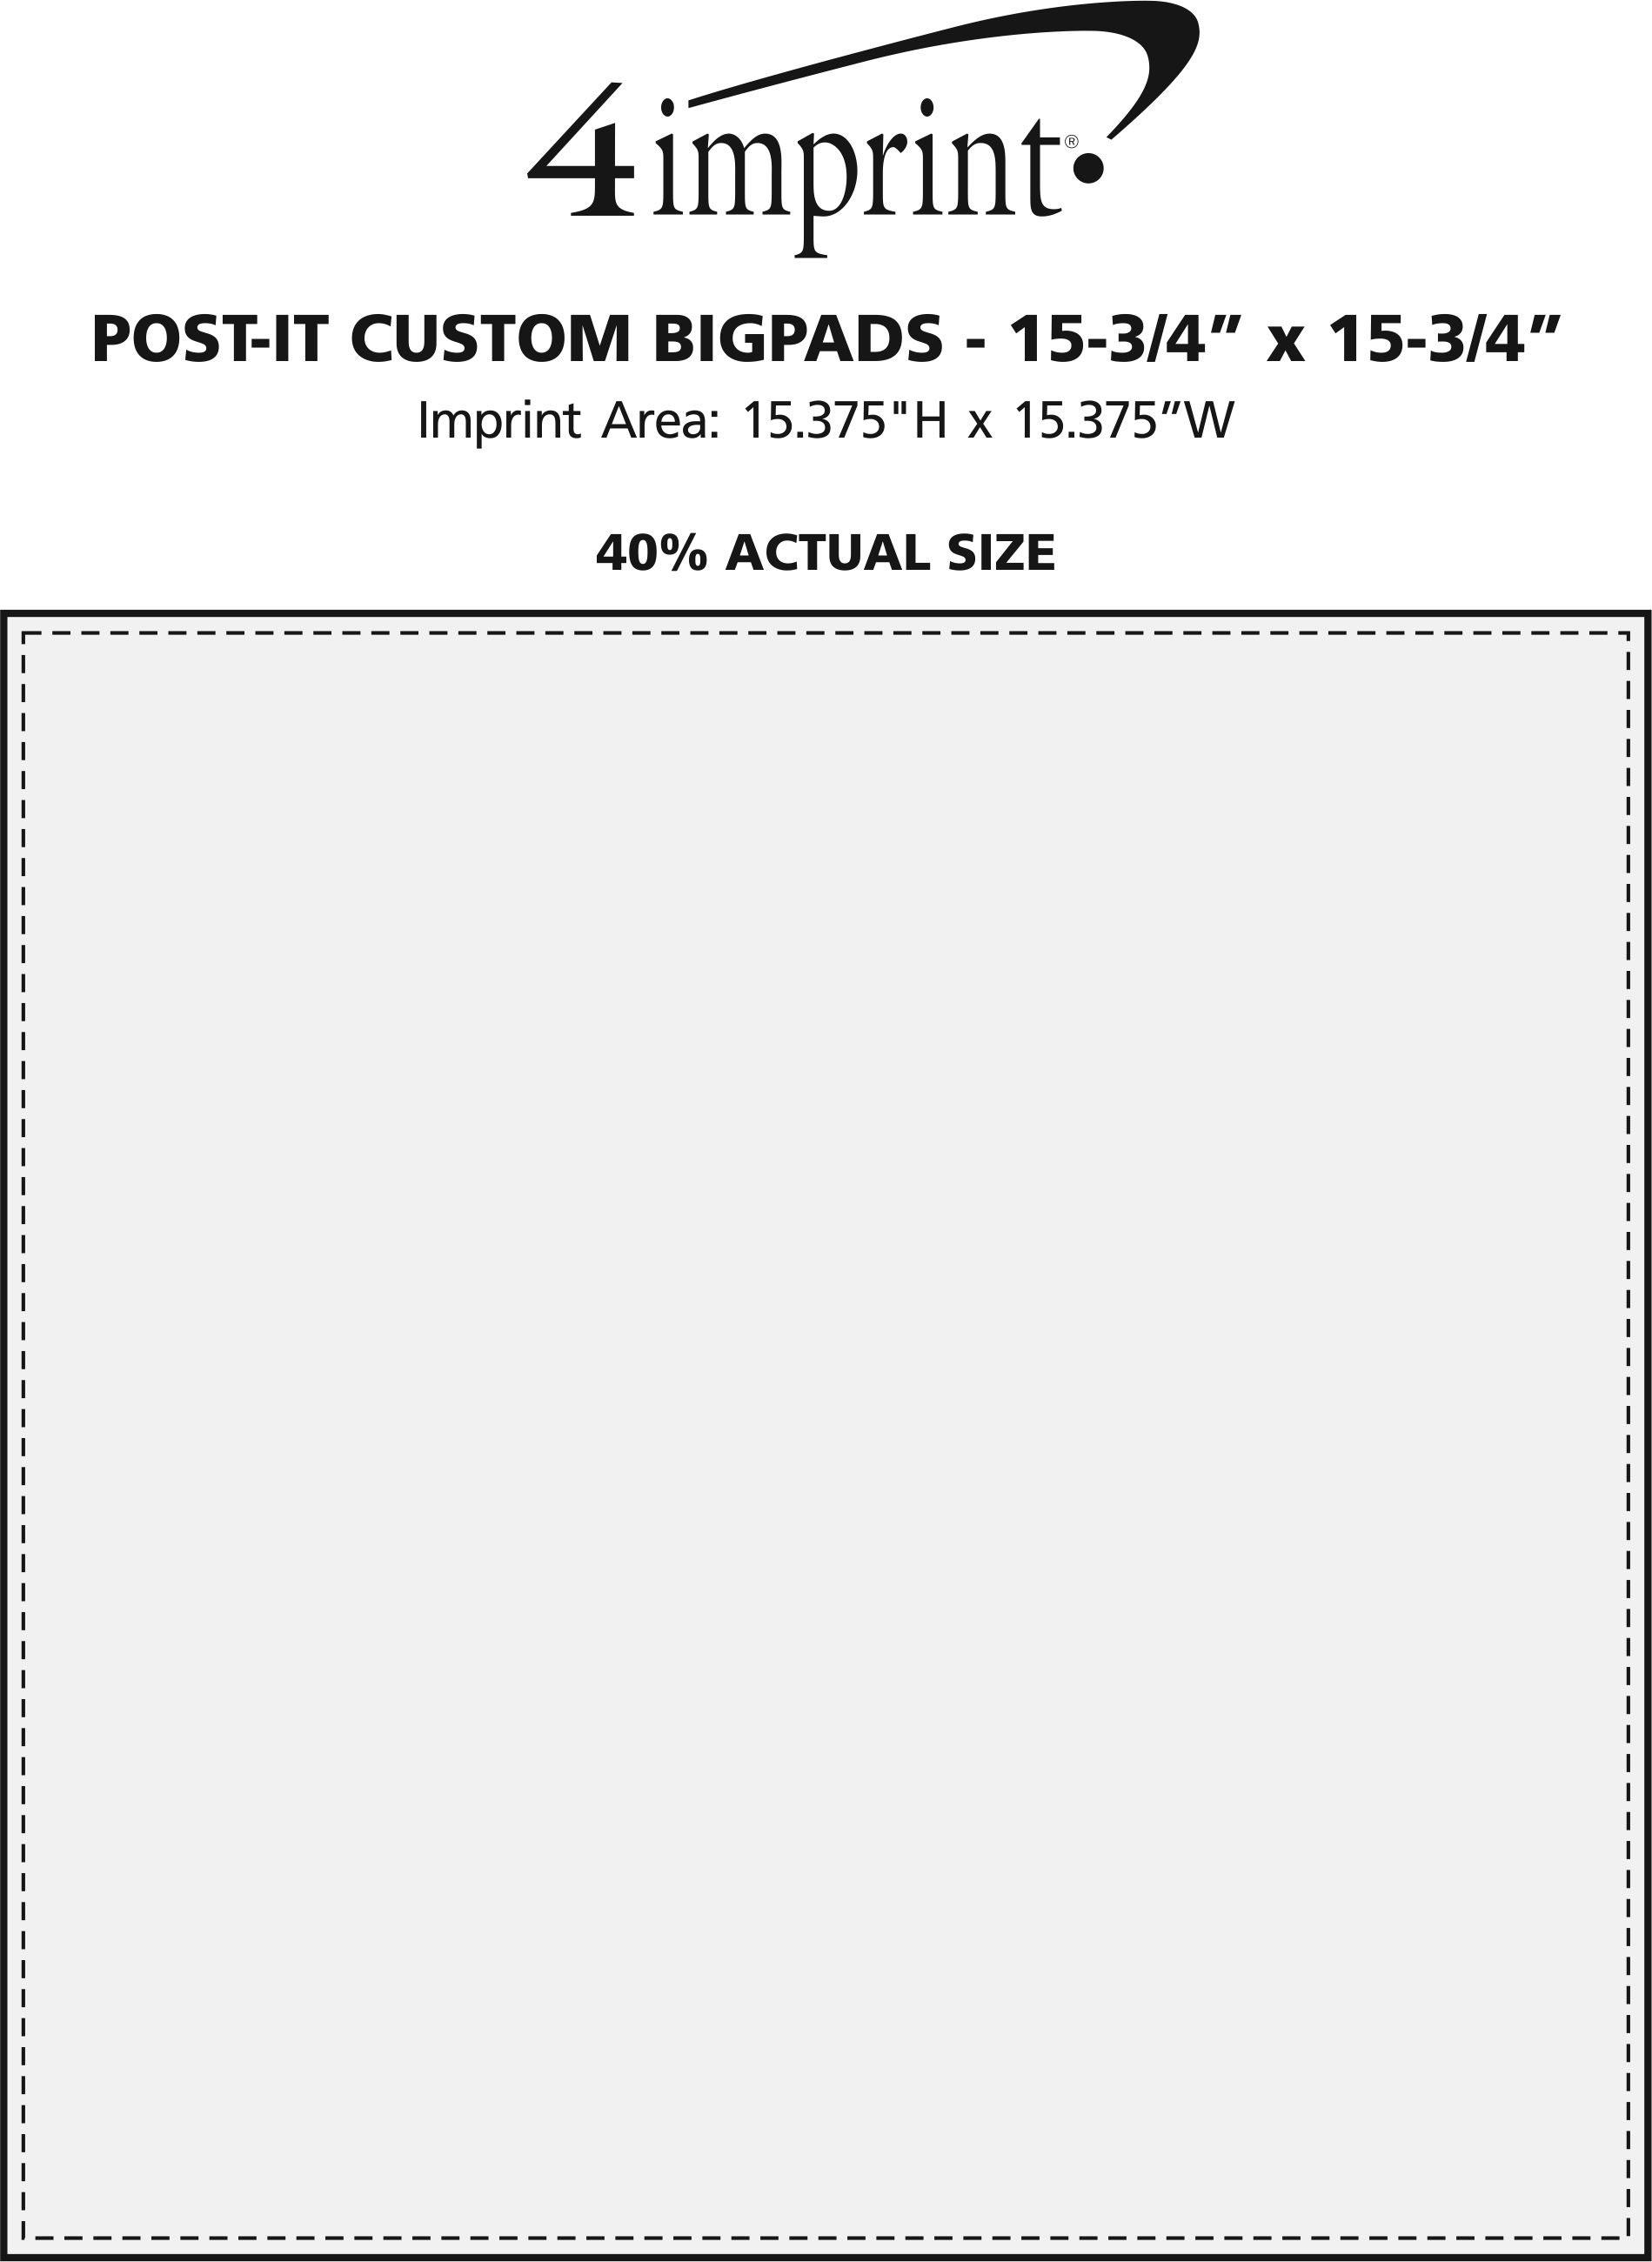 "Imprint Area of Post-it® Custom BigPads - 15-3/4"" x 15-3/4"""